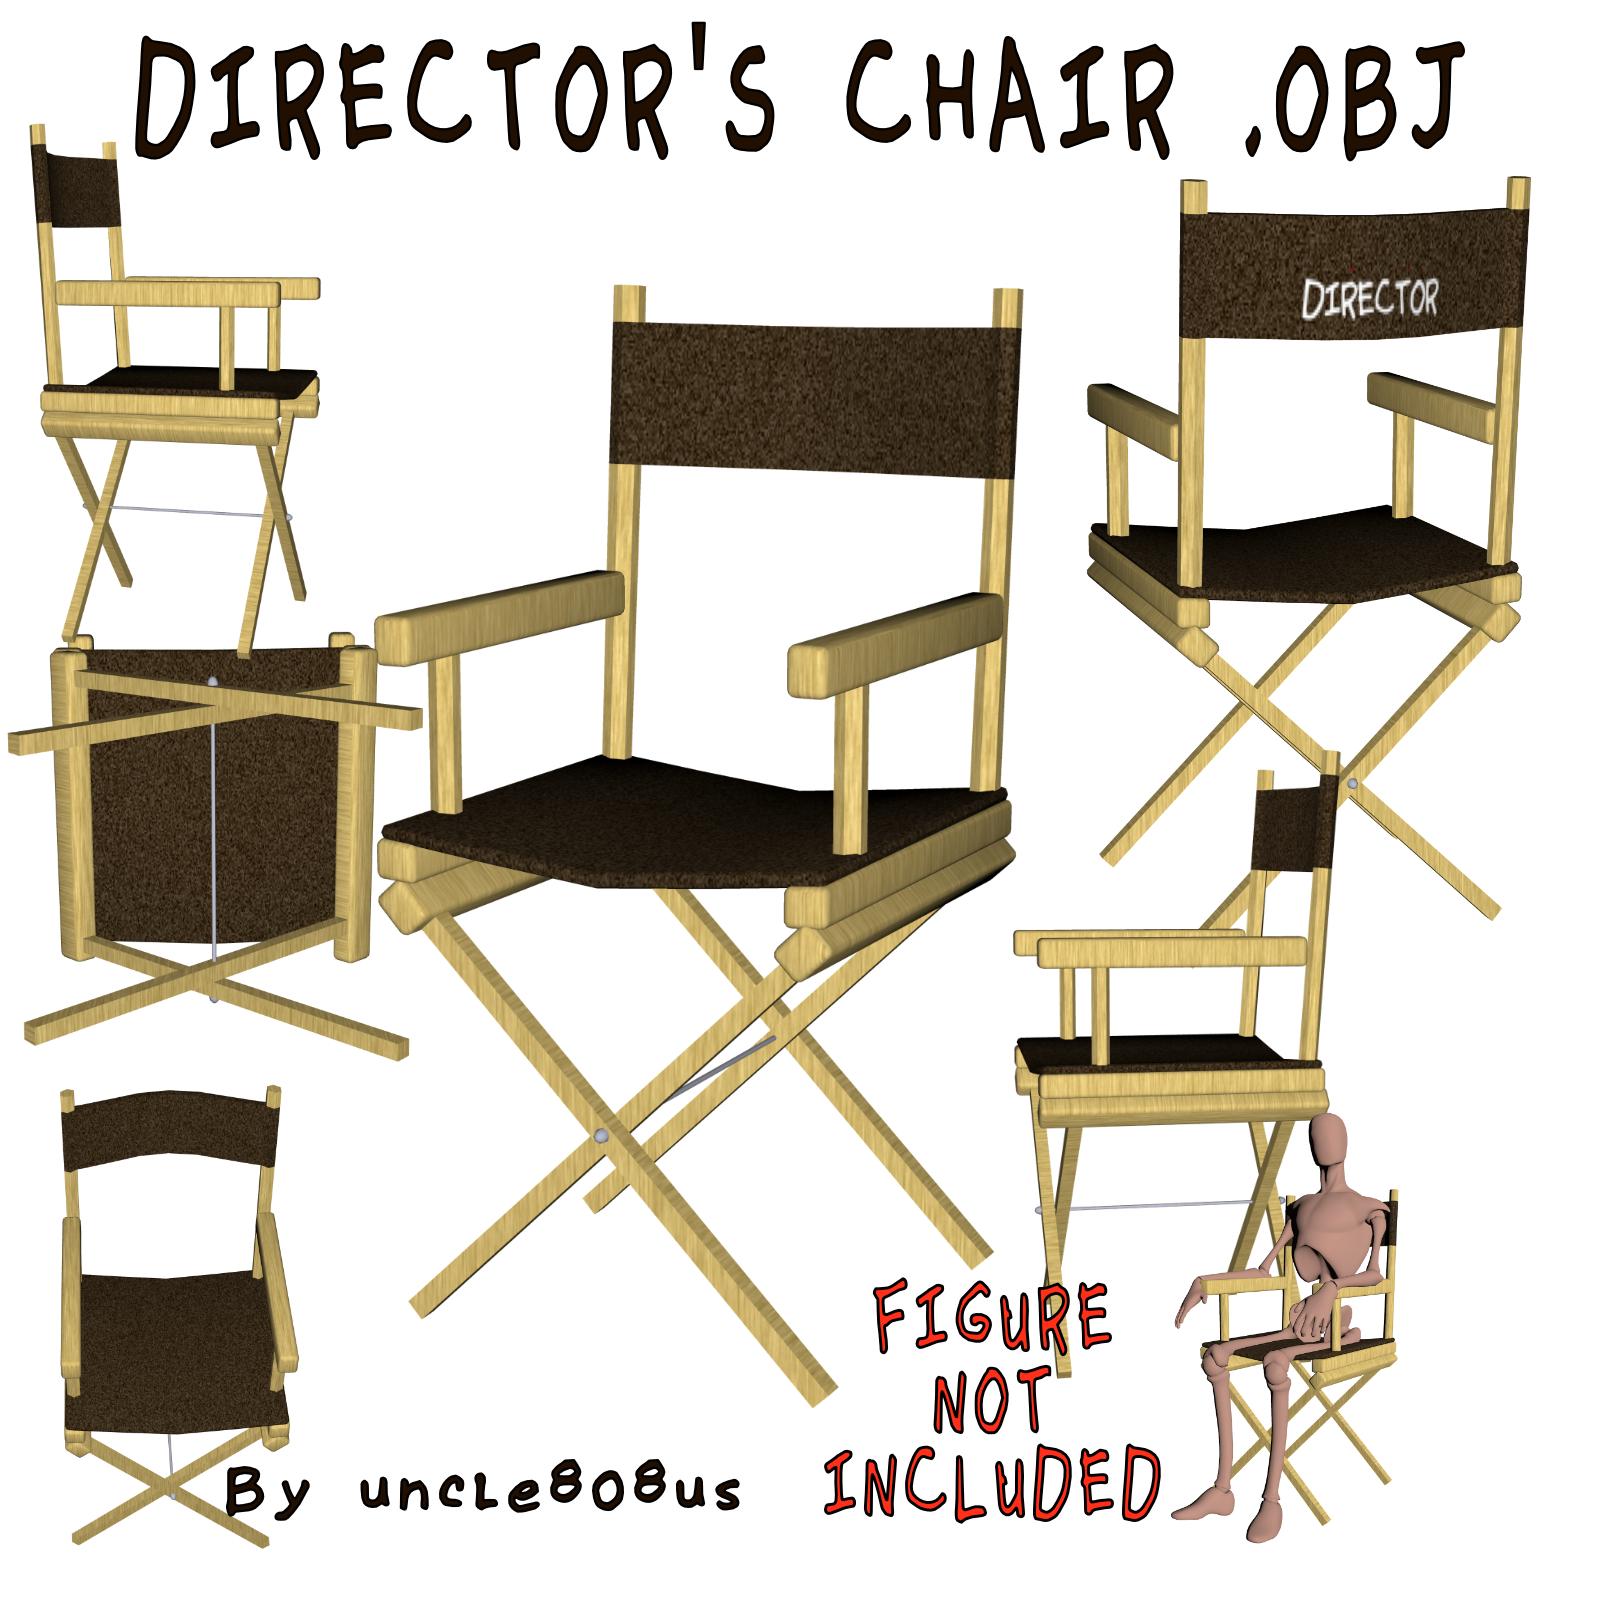 Director's Chair 3D Object 3d model  obj 274163